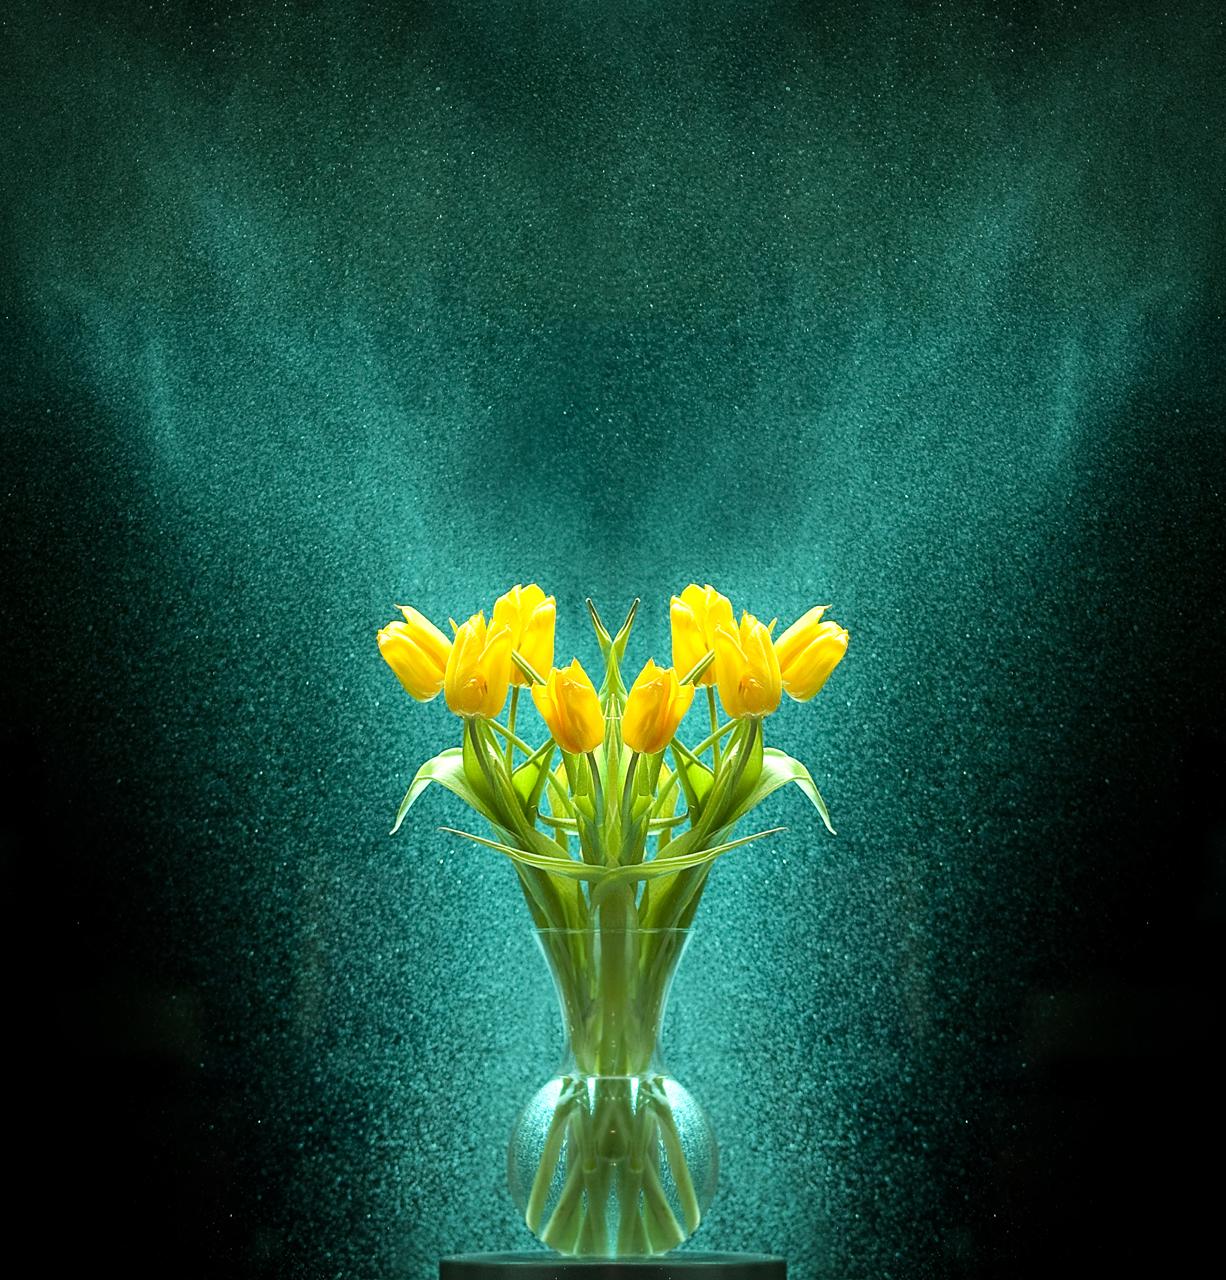 Yellow Tulips, Green Mist (103 of 365)